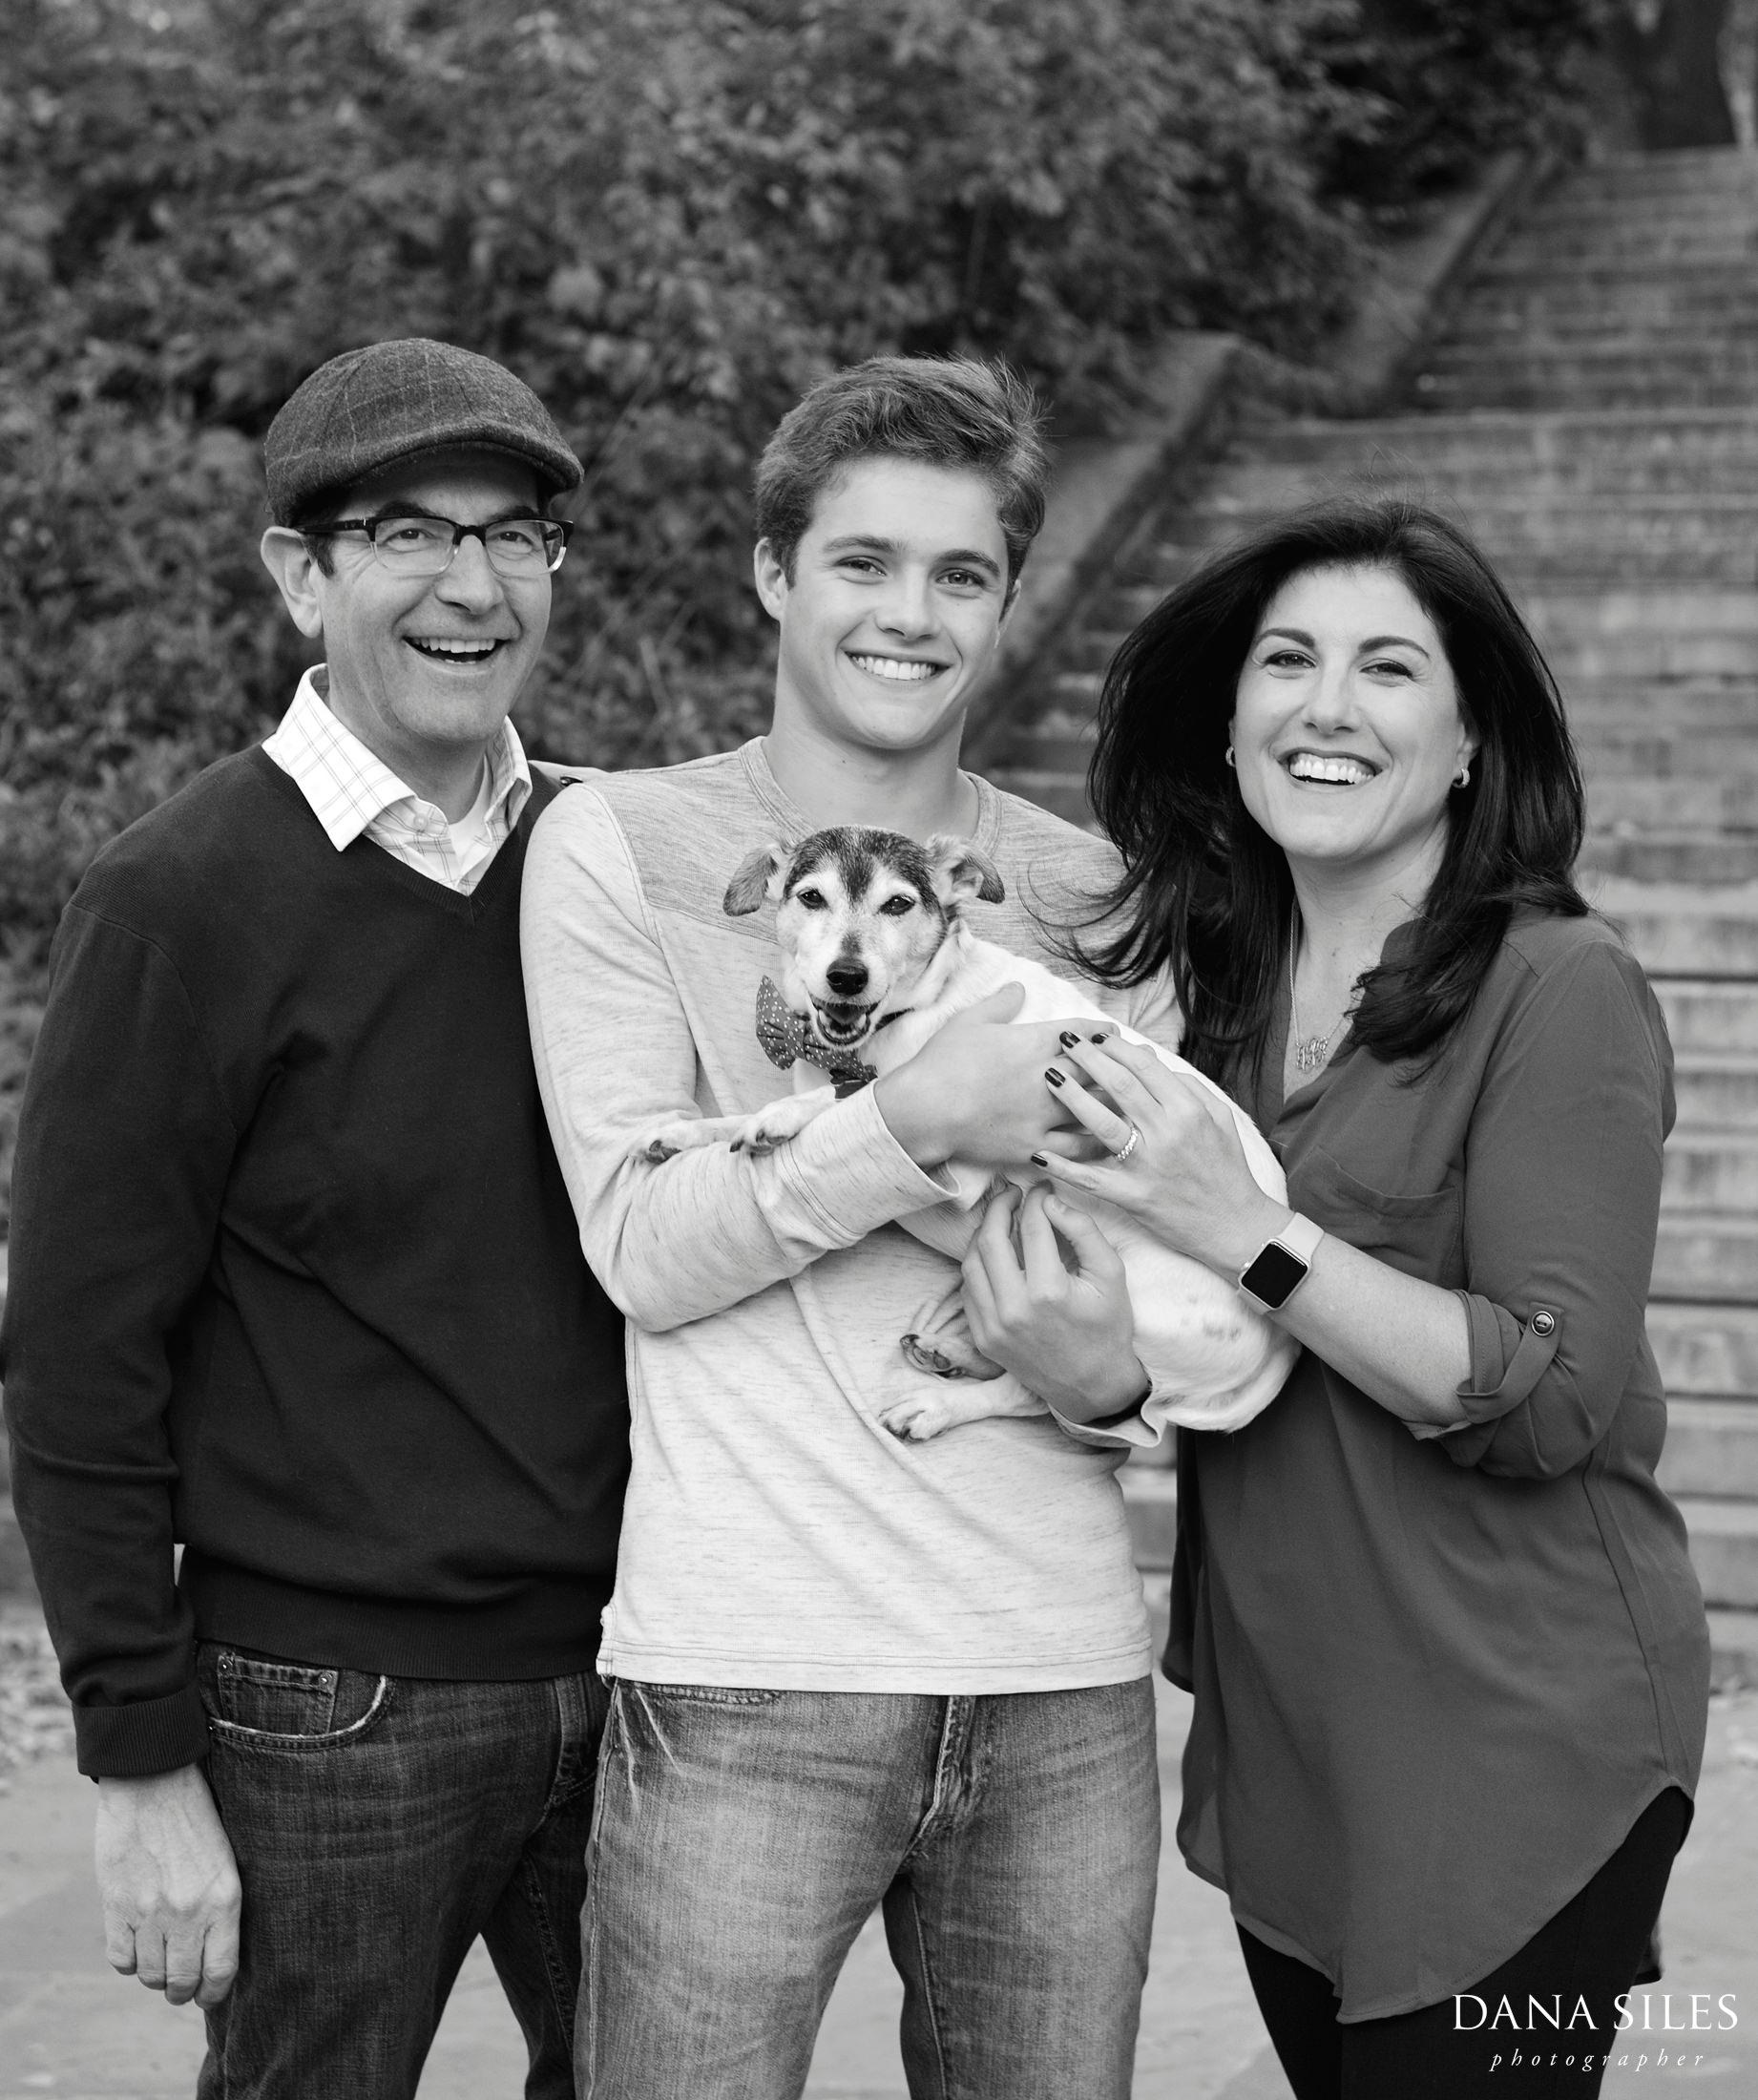 nyc-family-portrait-dana-siles-1